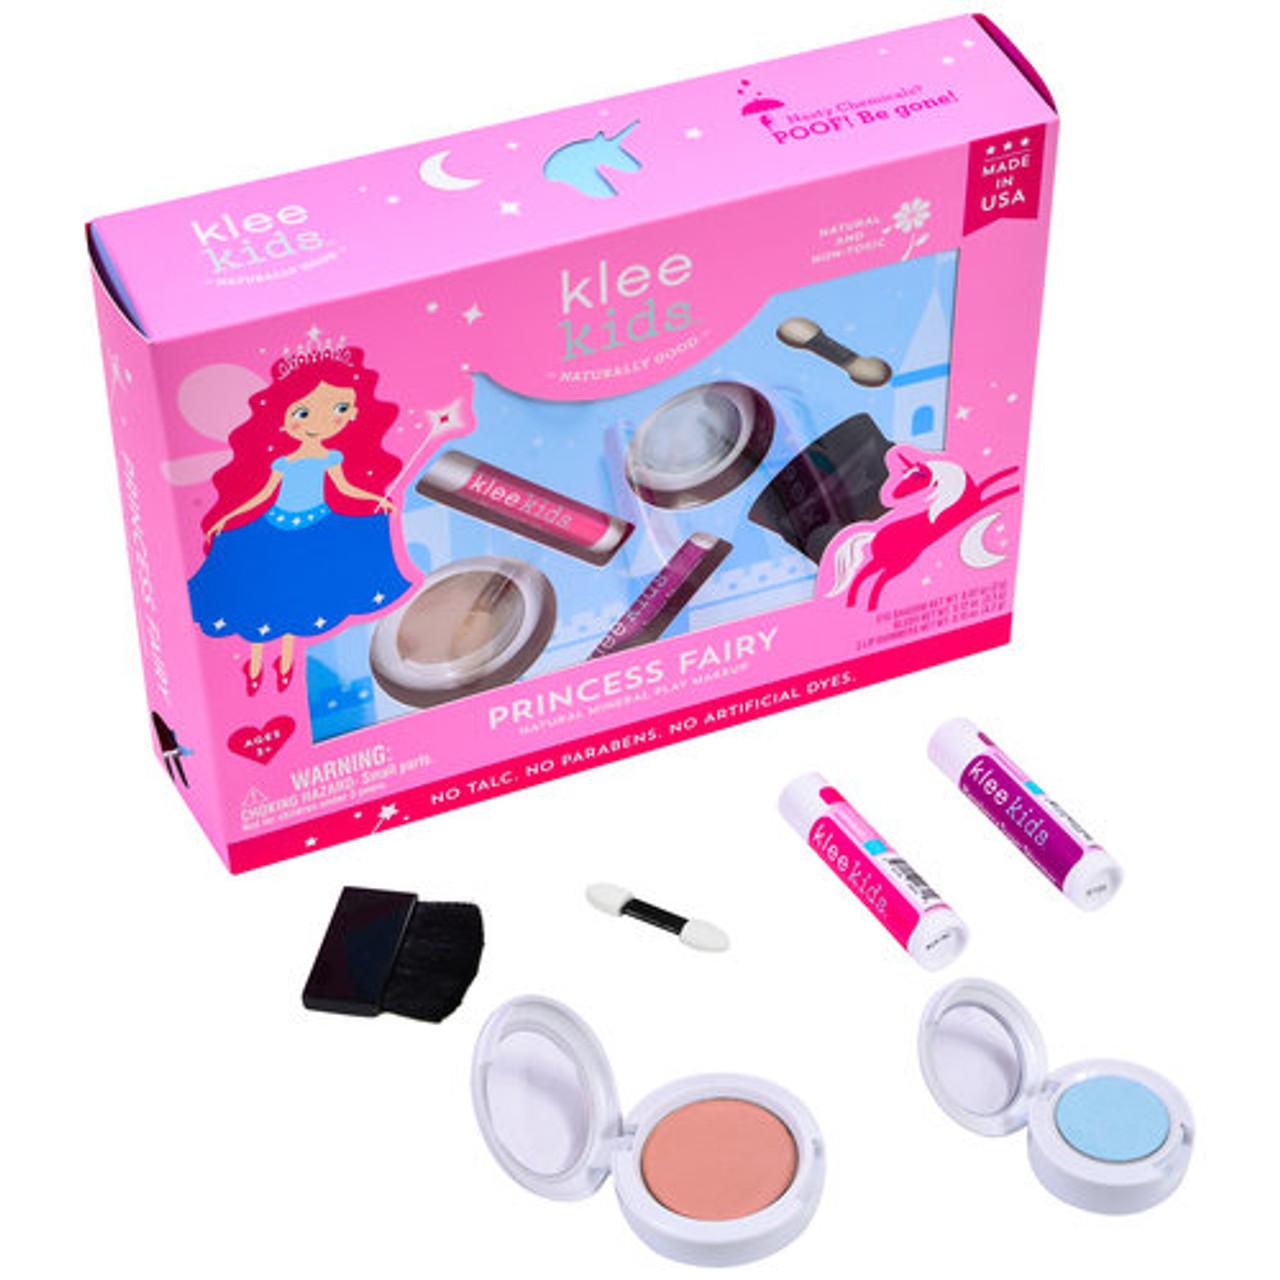 38b6a11c30 Klee Kids All-Natural Mineral 4 Piece Makeup Play Kit - Princess Fairy